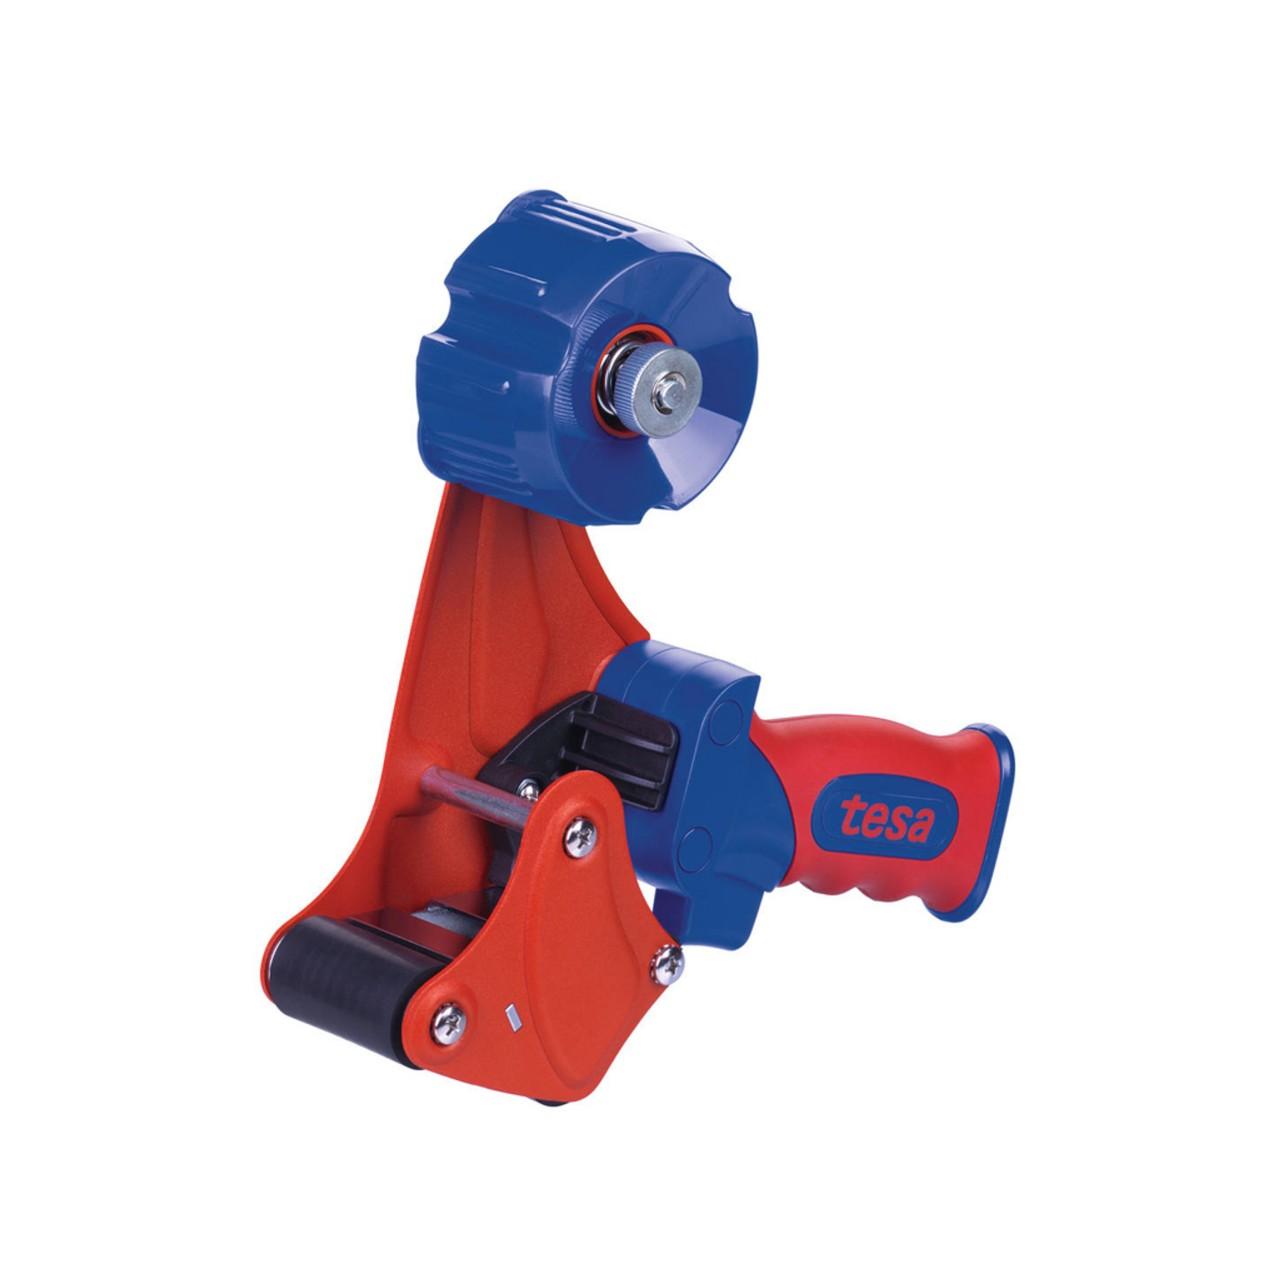 tesa 56402, Handabroller PREMIUM, rot-blau